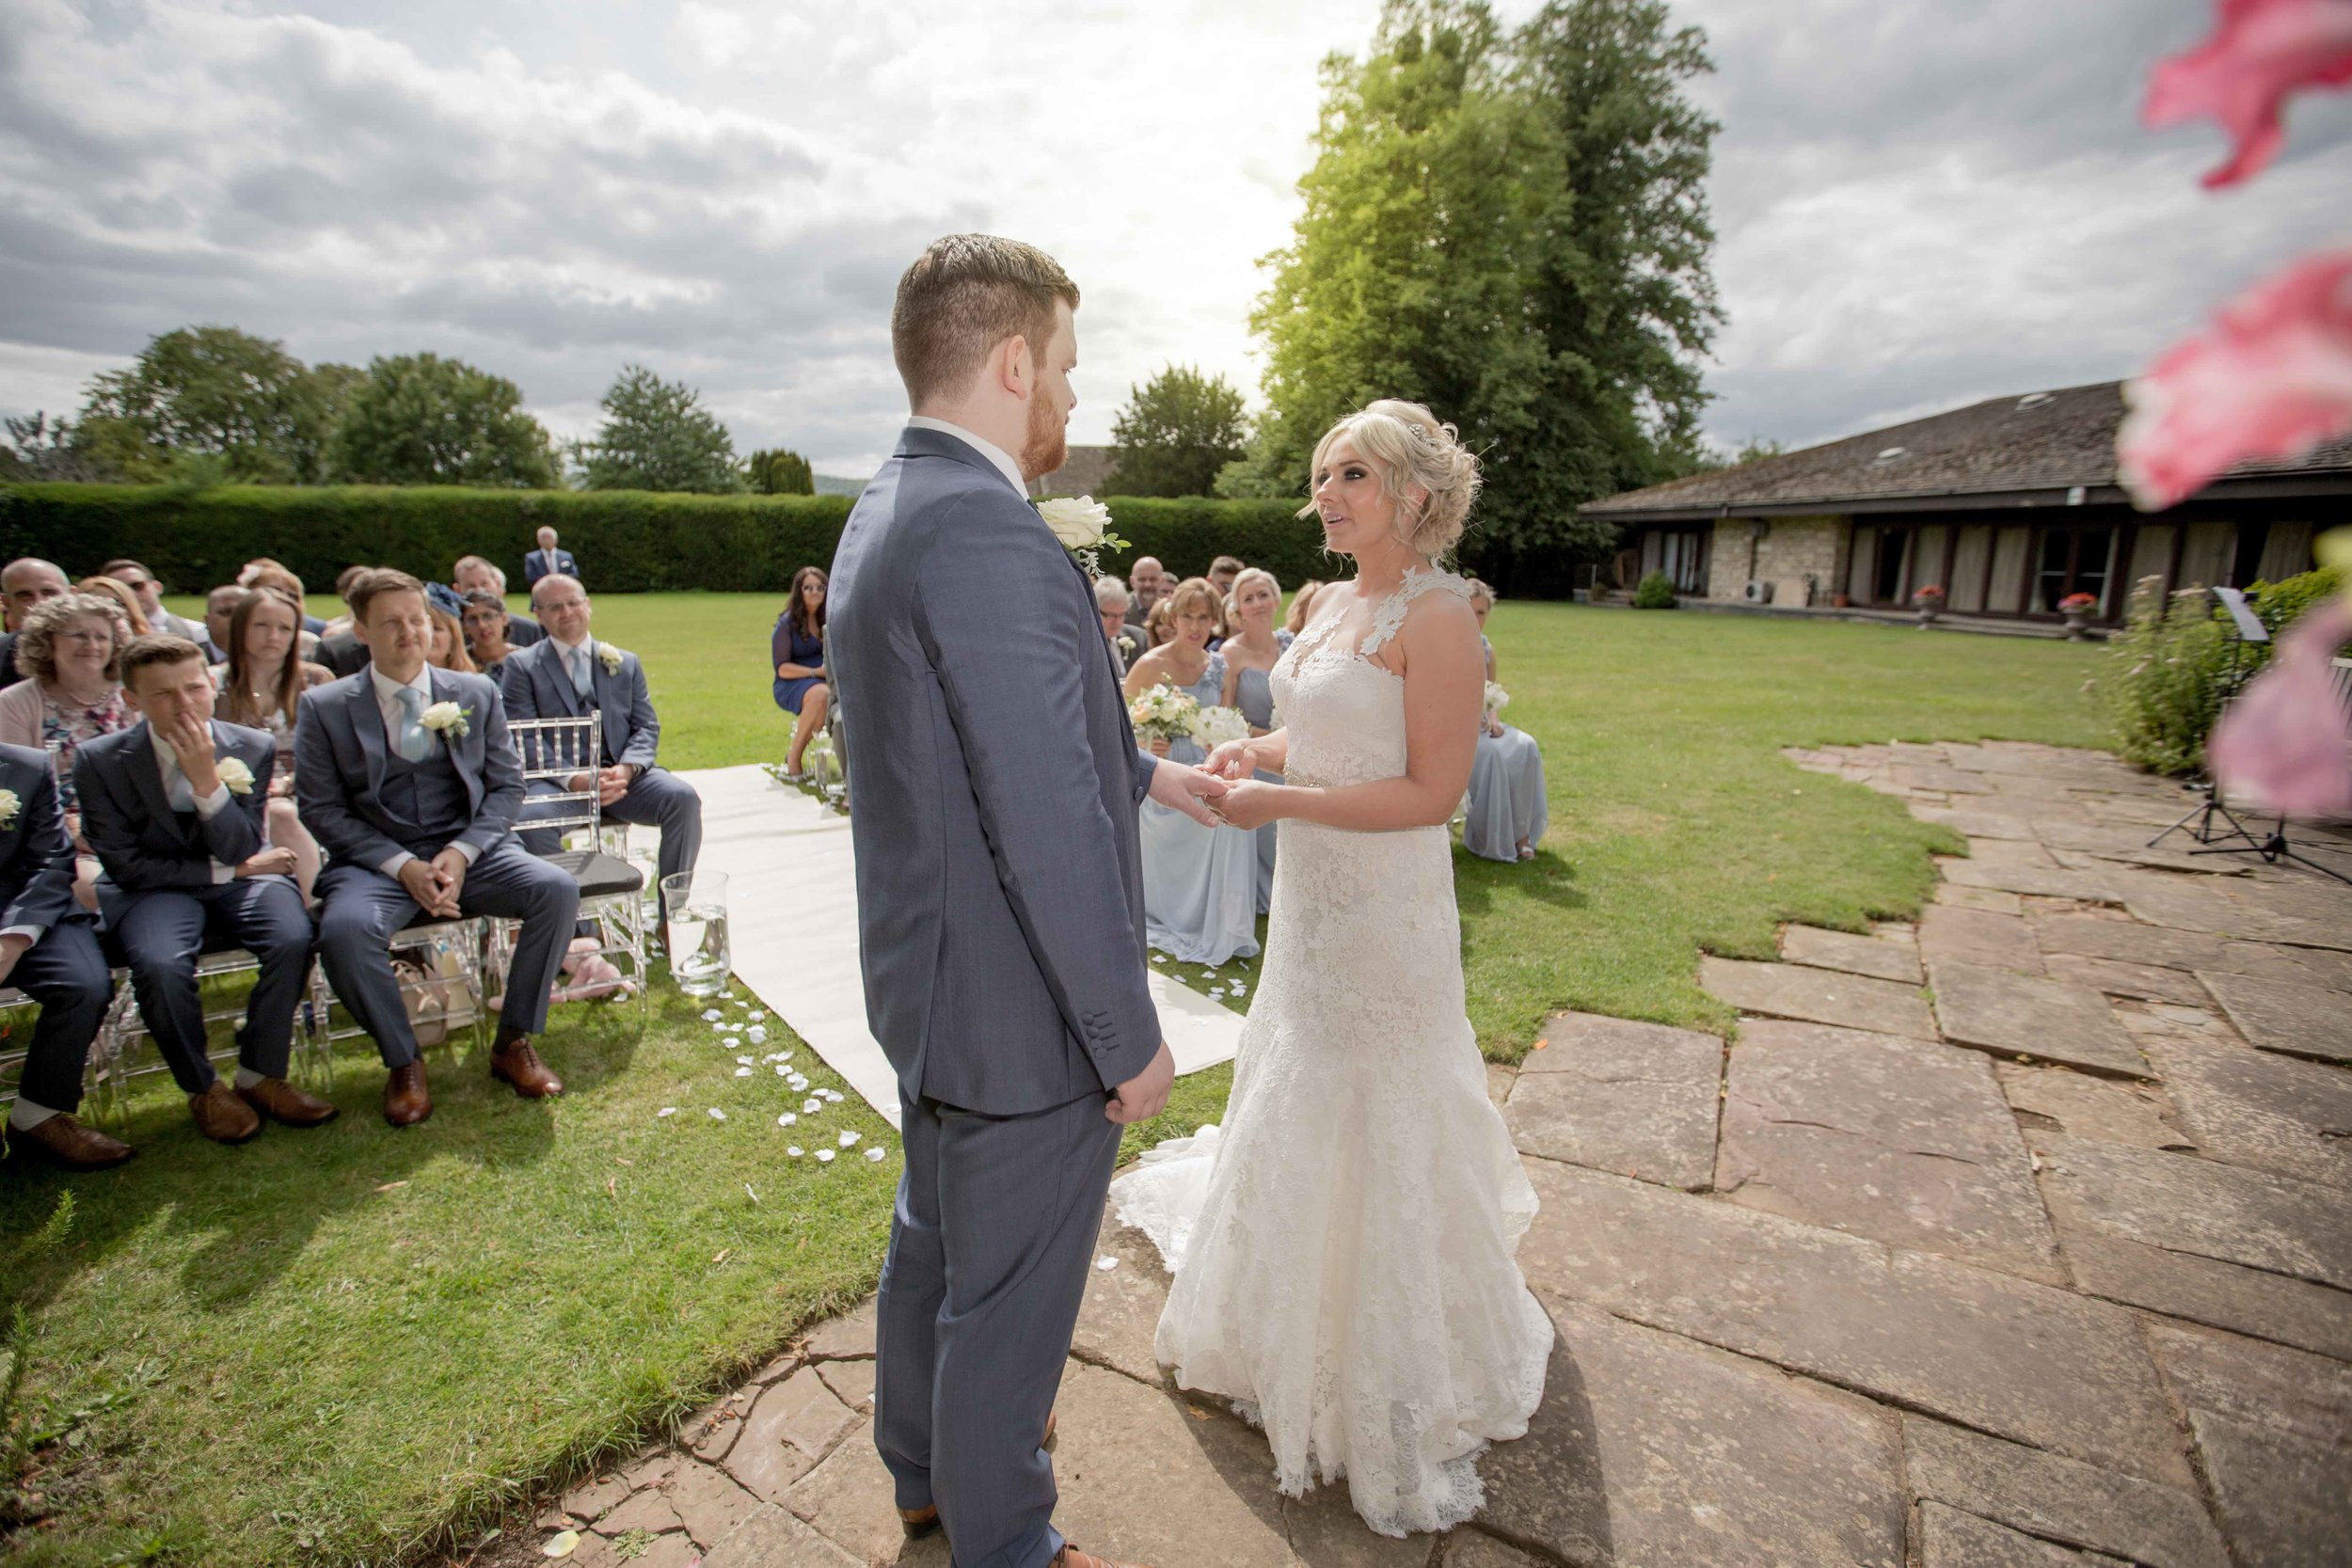 cotswold-wedding-photography-at-stonehouse-court-hotel-natalia-smith-photography-gloucestershire-wedding-photographer-38.jpg